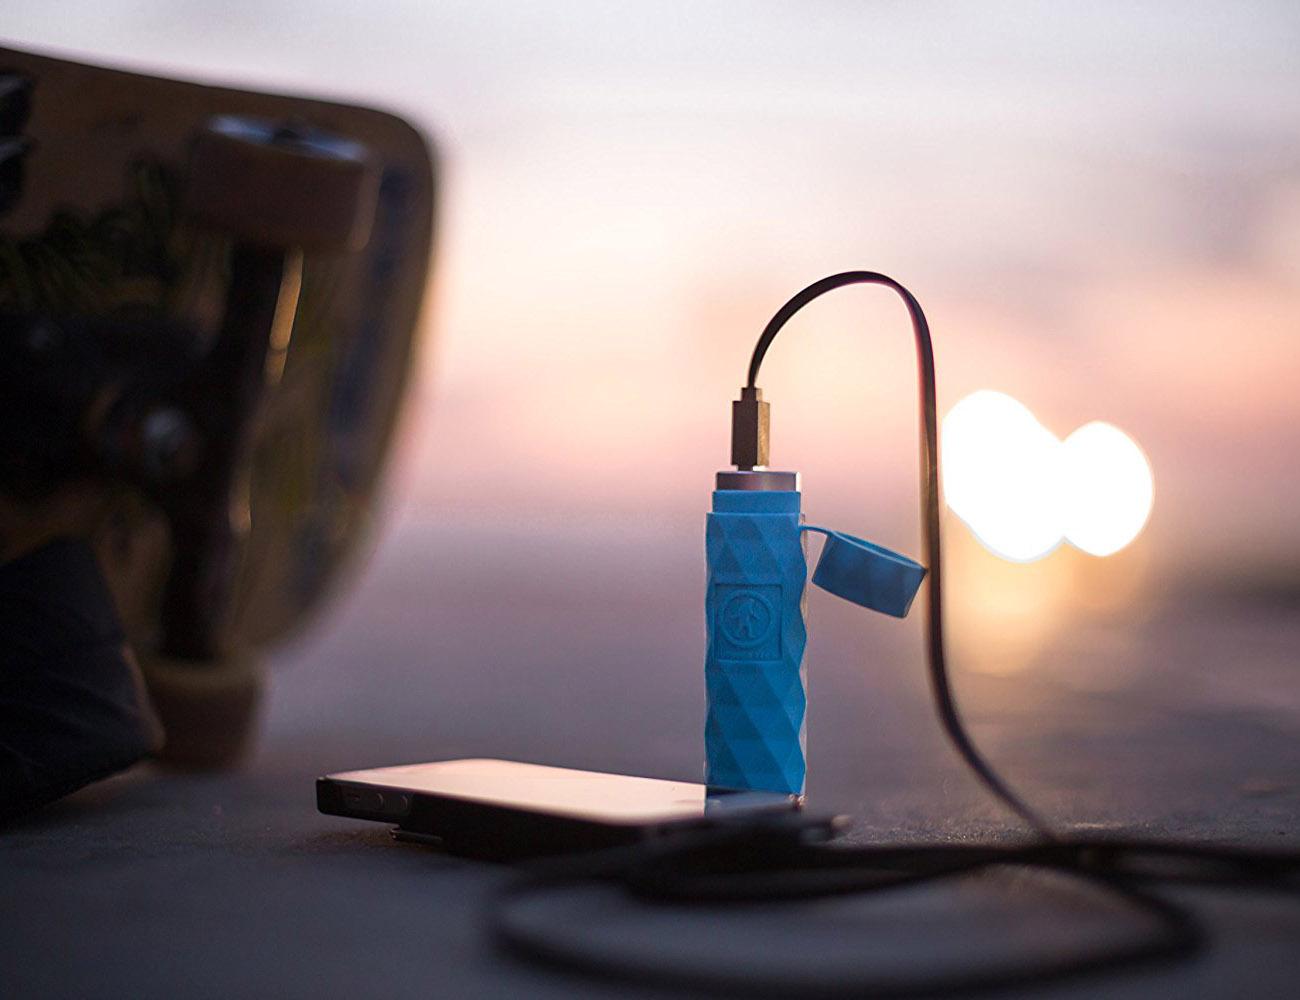 Kodiak Mini USB Power Bank